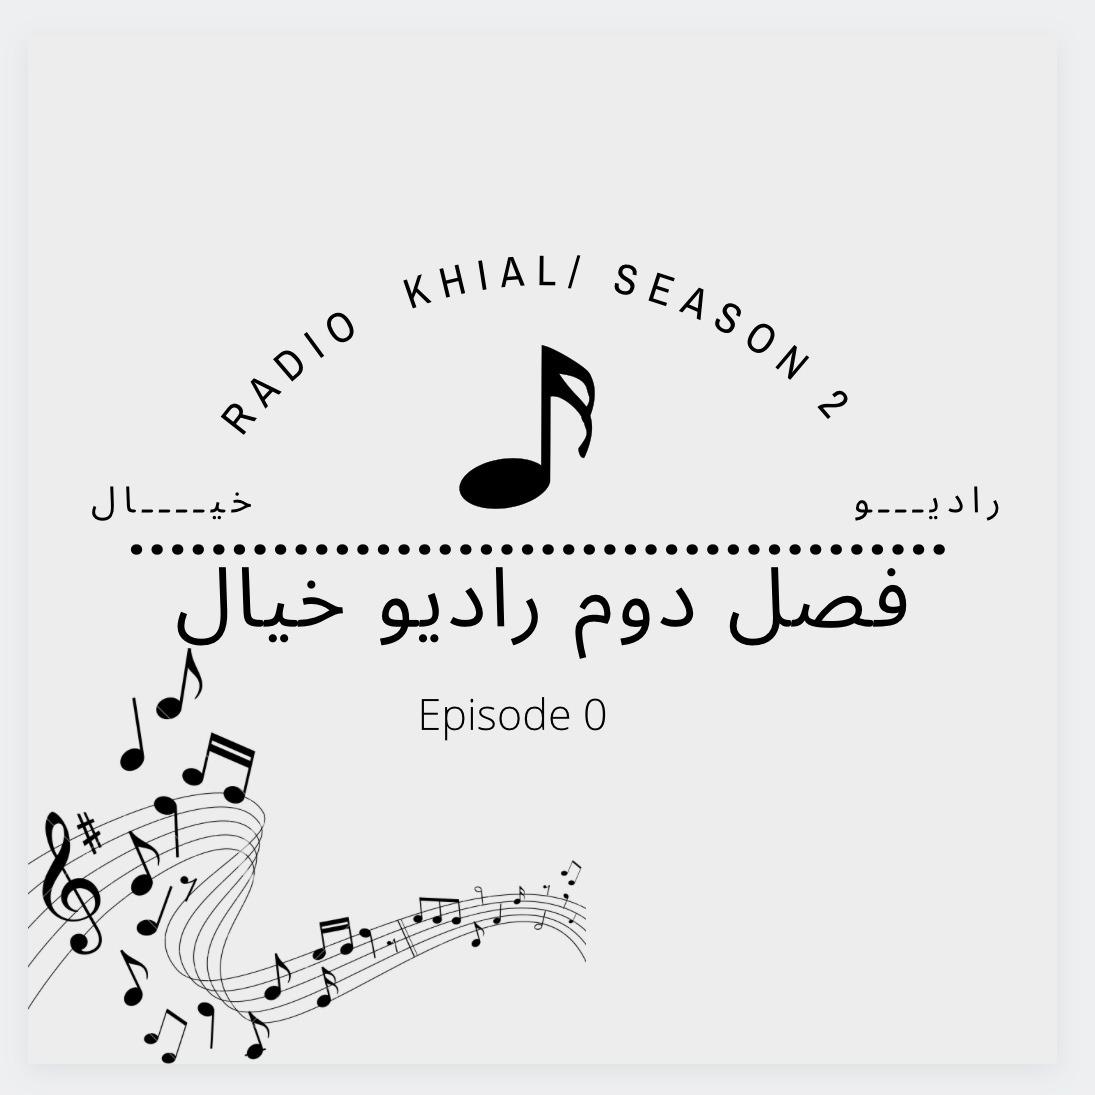 Episode 0 - Season 2 /  با من بشنو